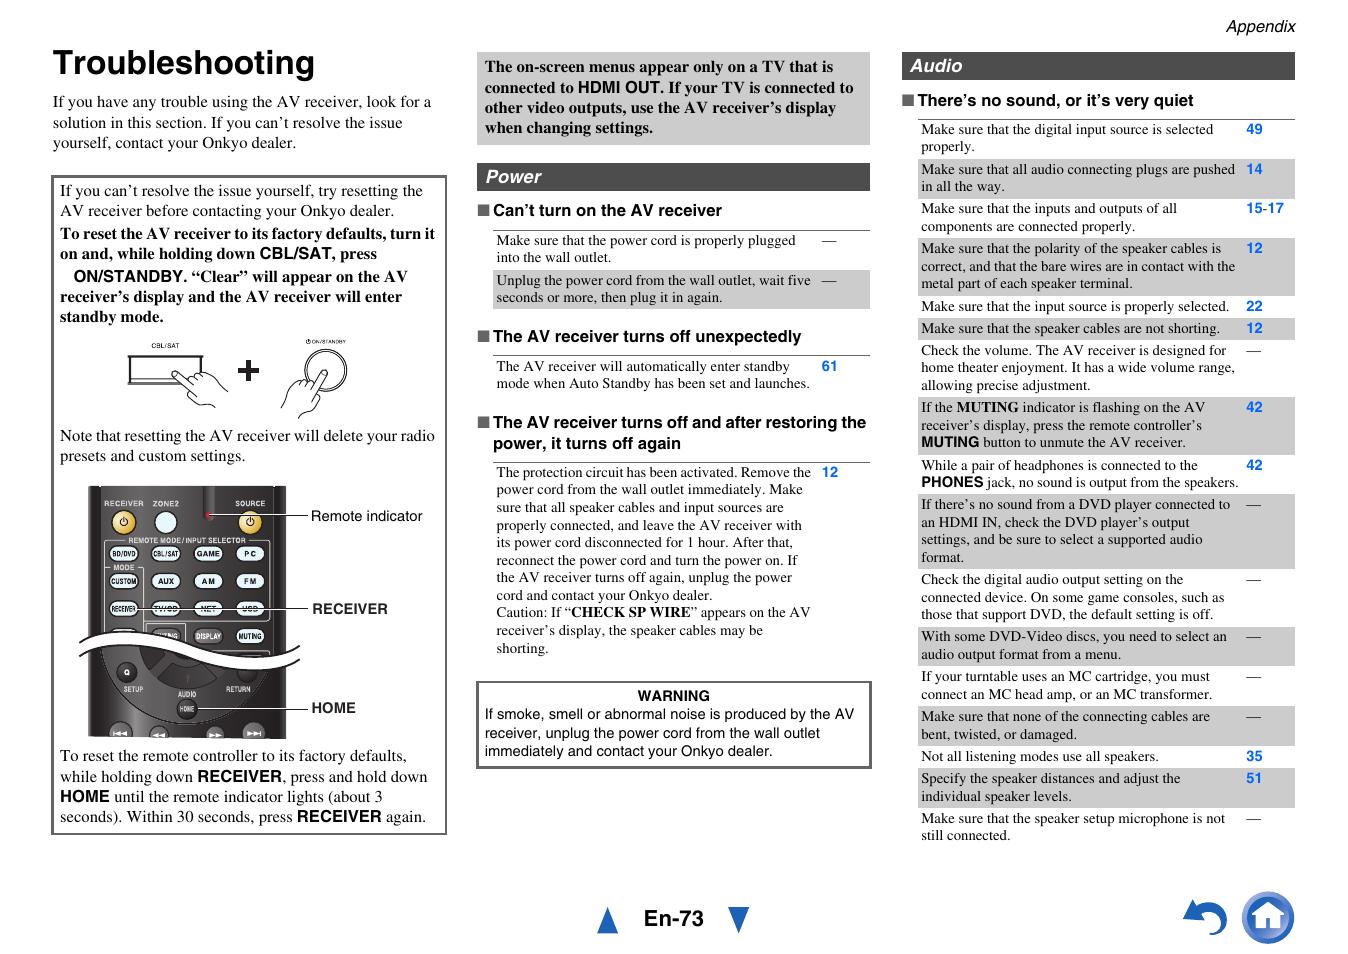 Appendix, Troubleshooting, En-73 | Onkyo AV Receiver HT-R791 User